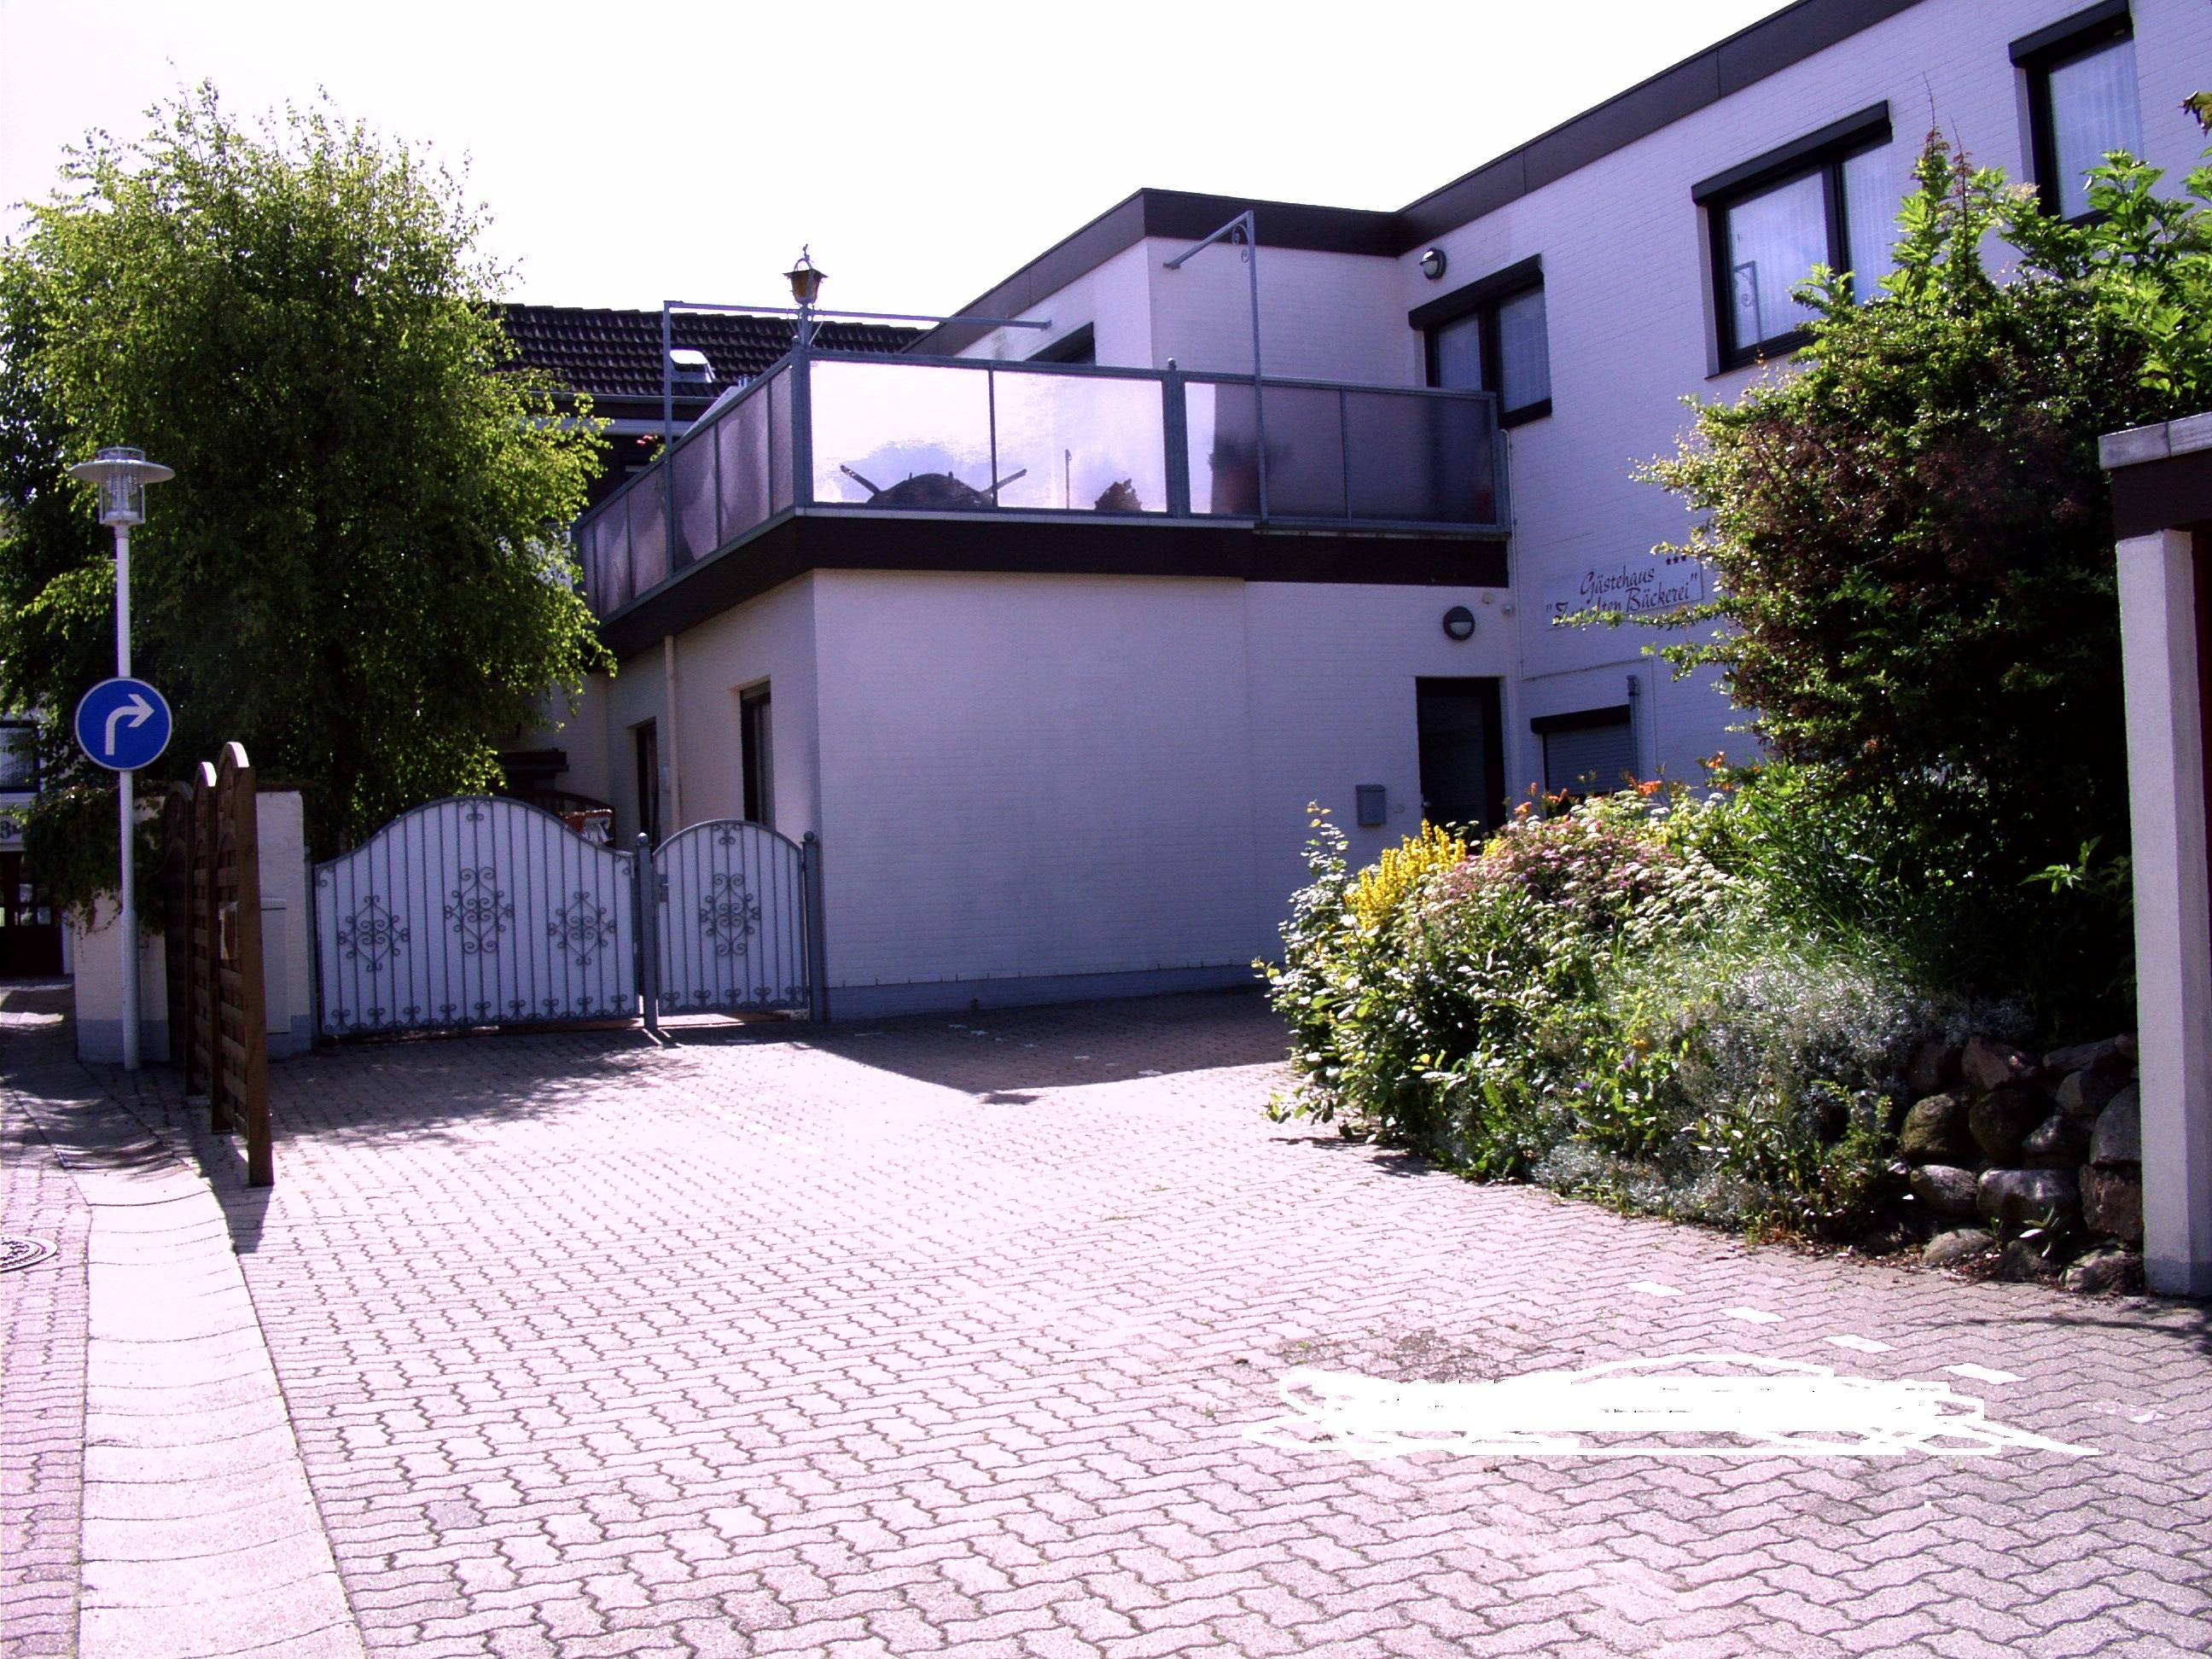 Gästehaus Alte Bäckerei - 235 (Büsum). Fewg.-2-Raum Nr.002